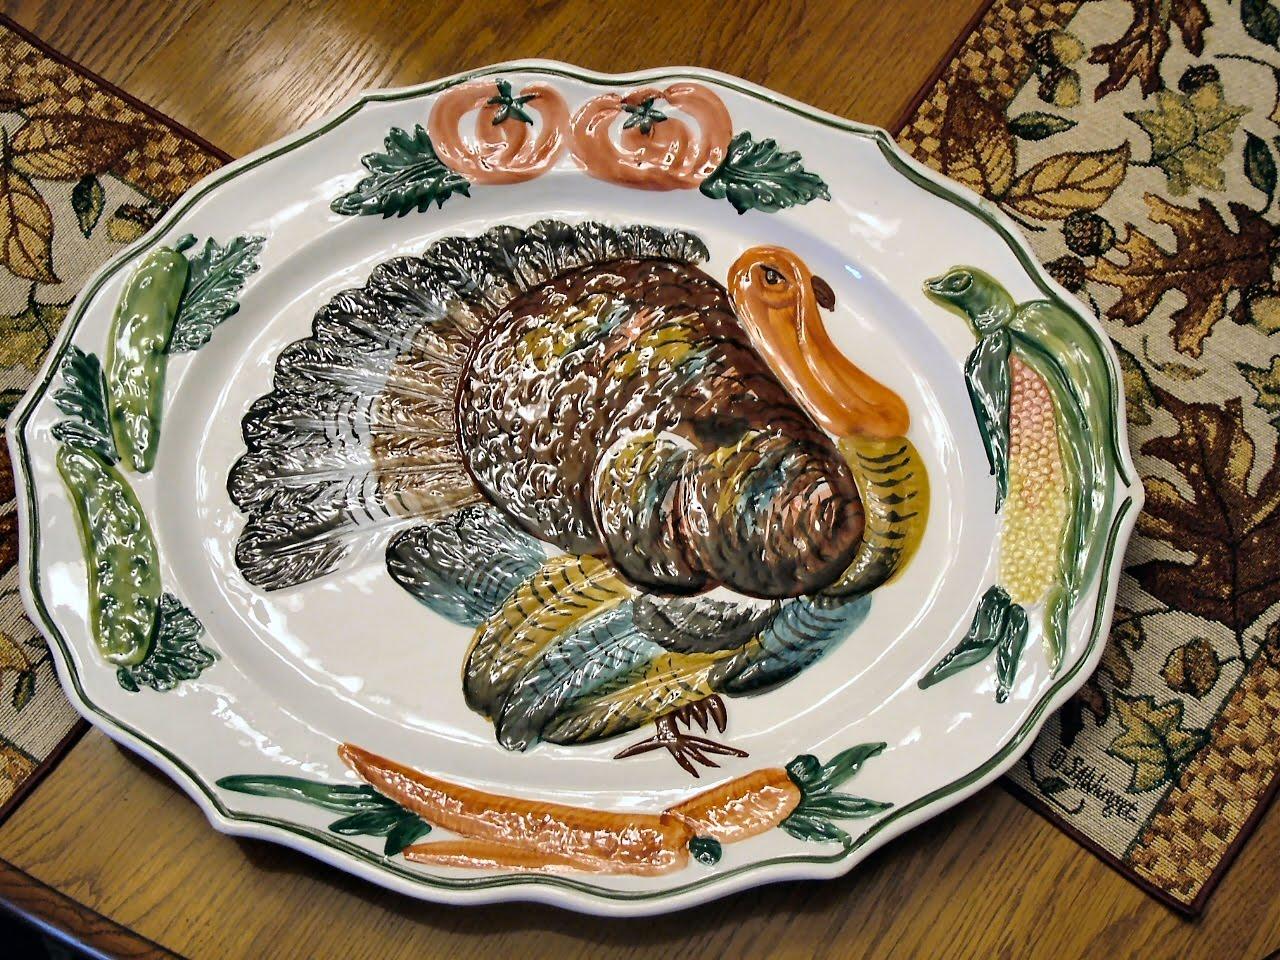 Thanksgiving Turkey Plate Or Platter For Serving